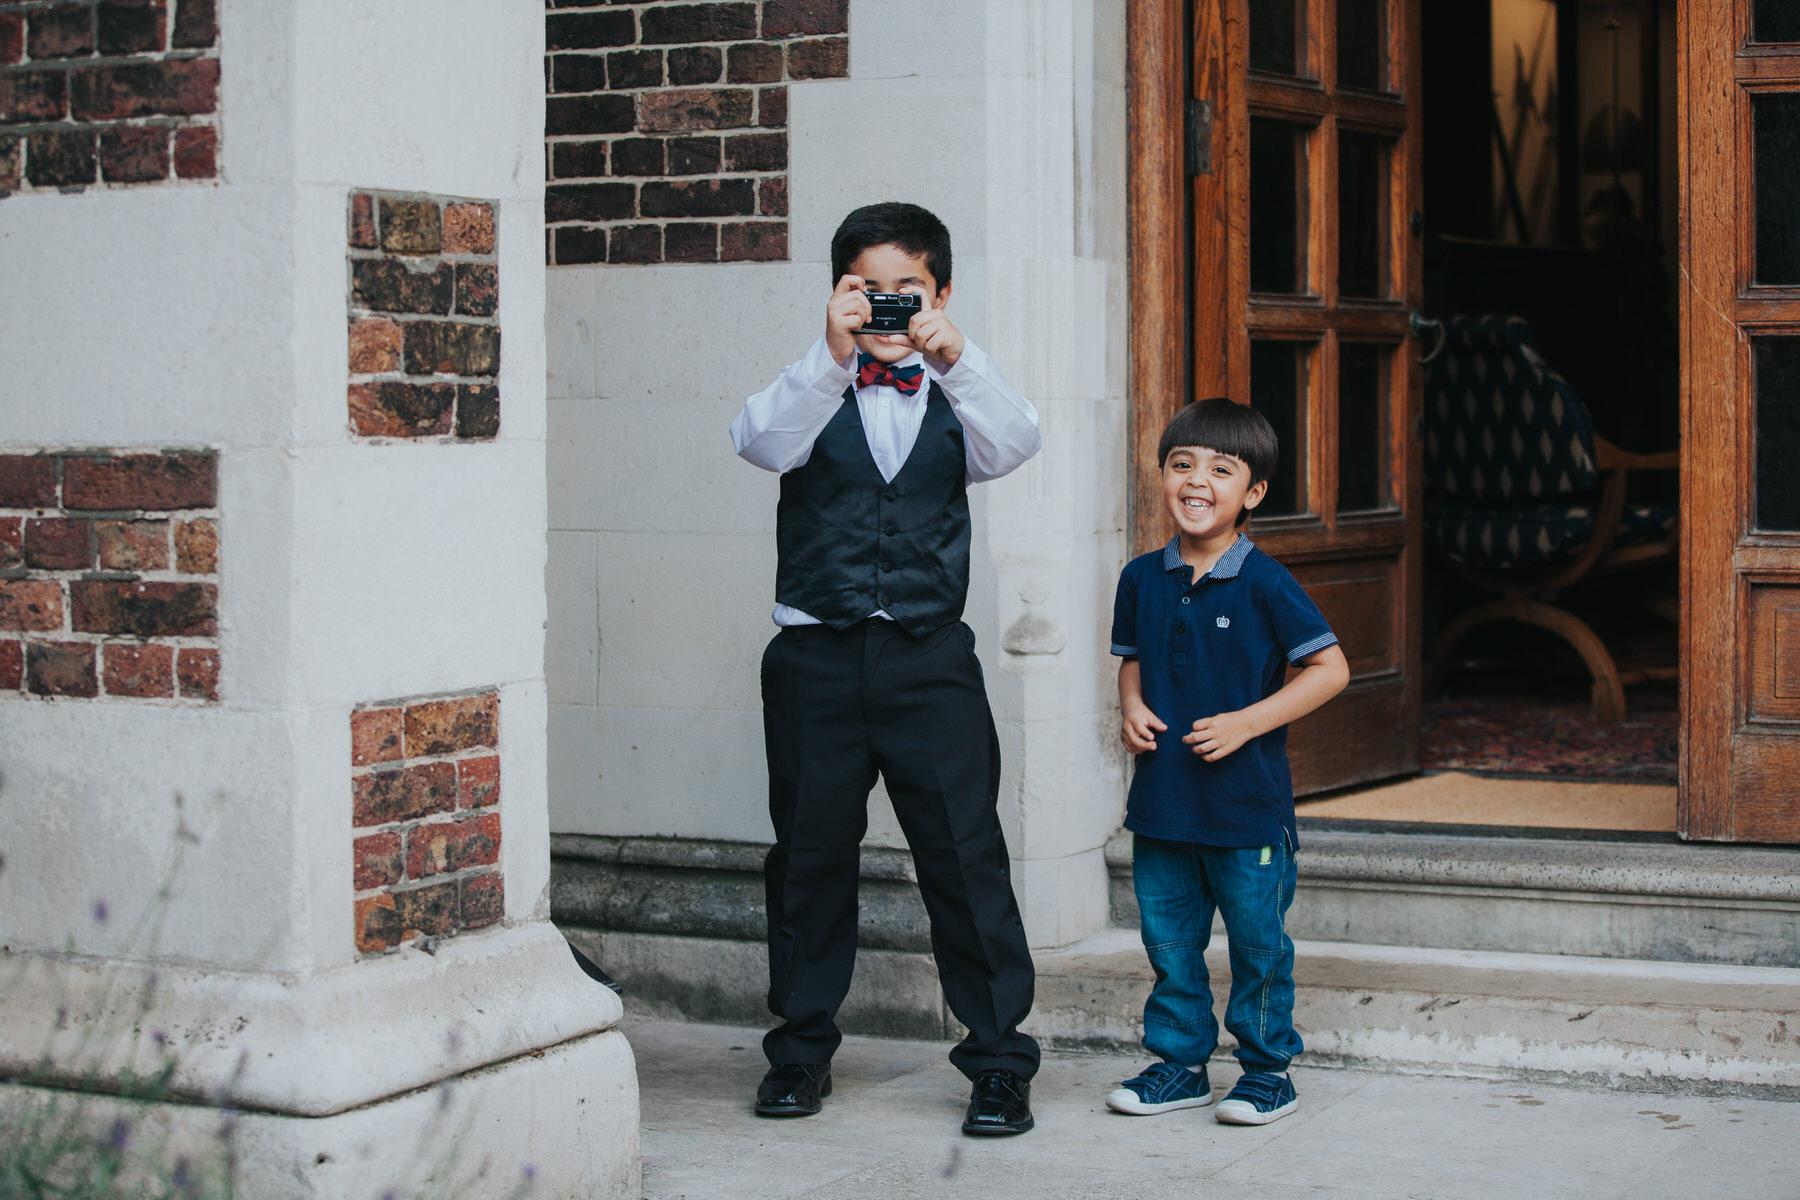 144-Anglo-Asian-London-Wedding-kids-with-camera.jpg